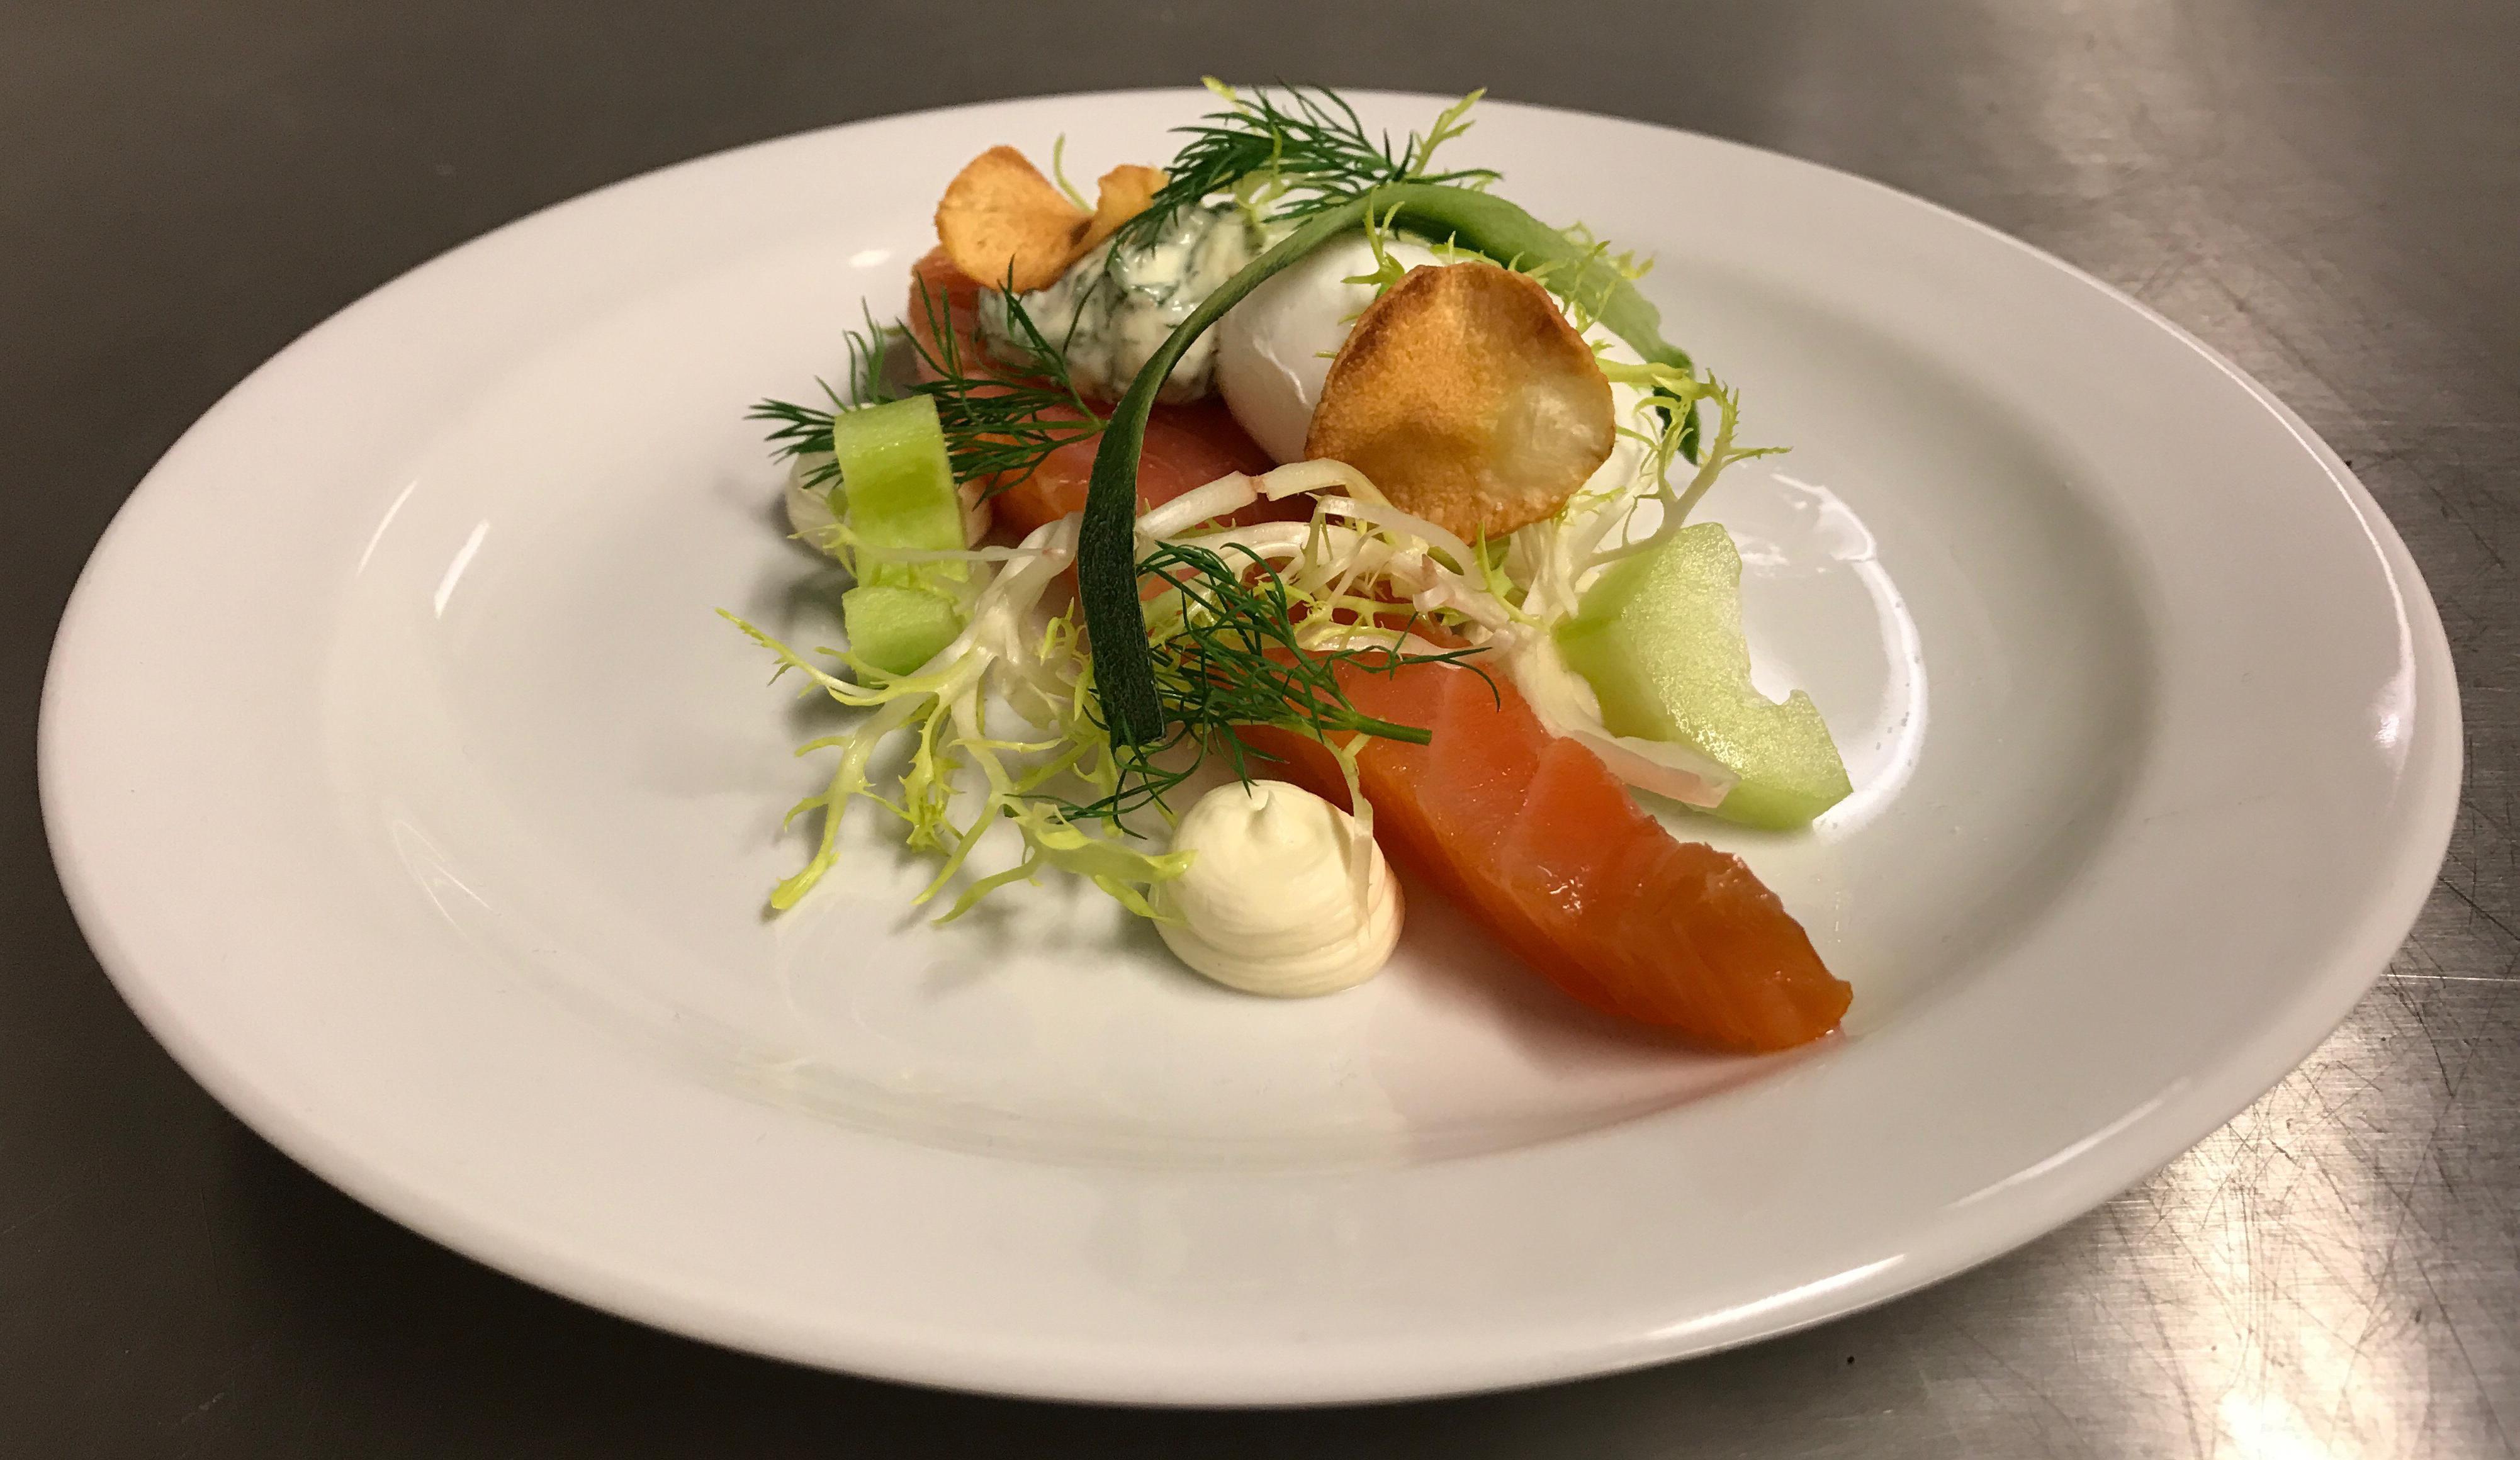 Røget laks med pocheret æg, rygeostecreme, dildmayonnaise, frisée-salat, agurk og havreflager ...